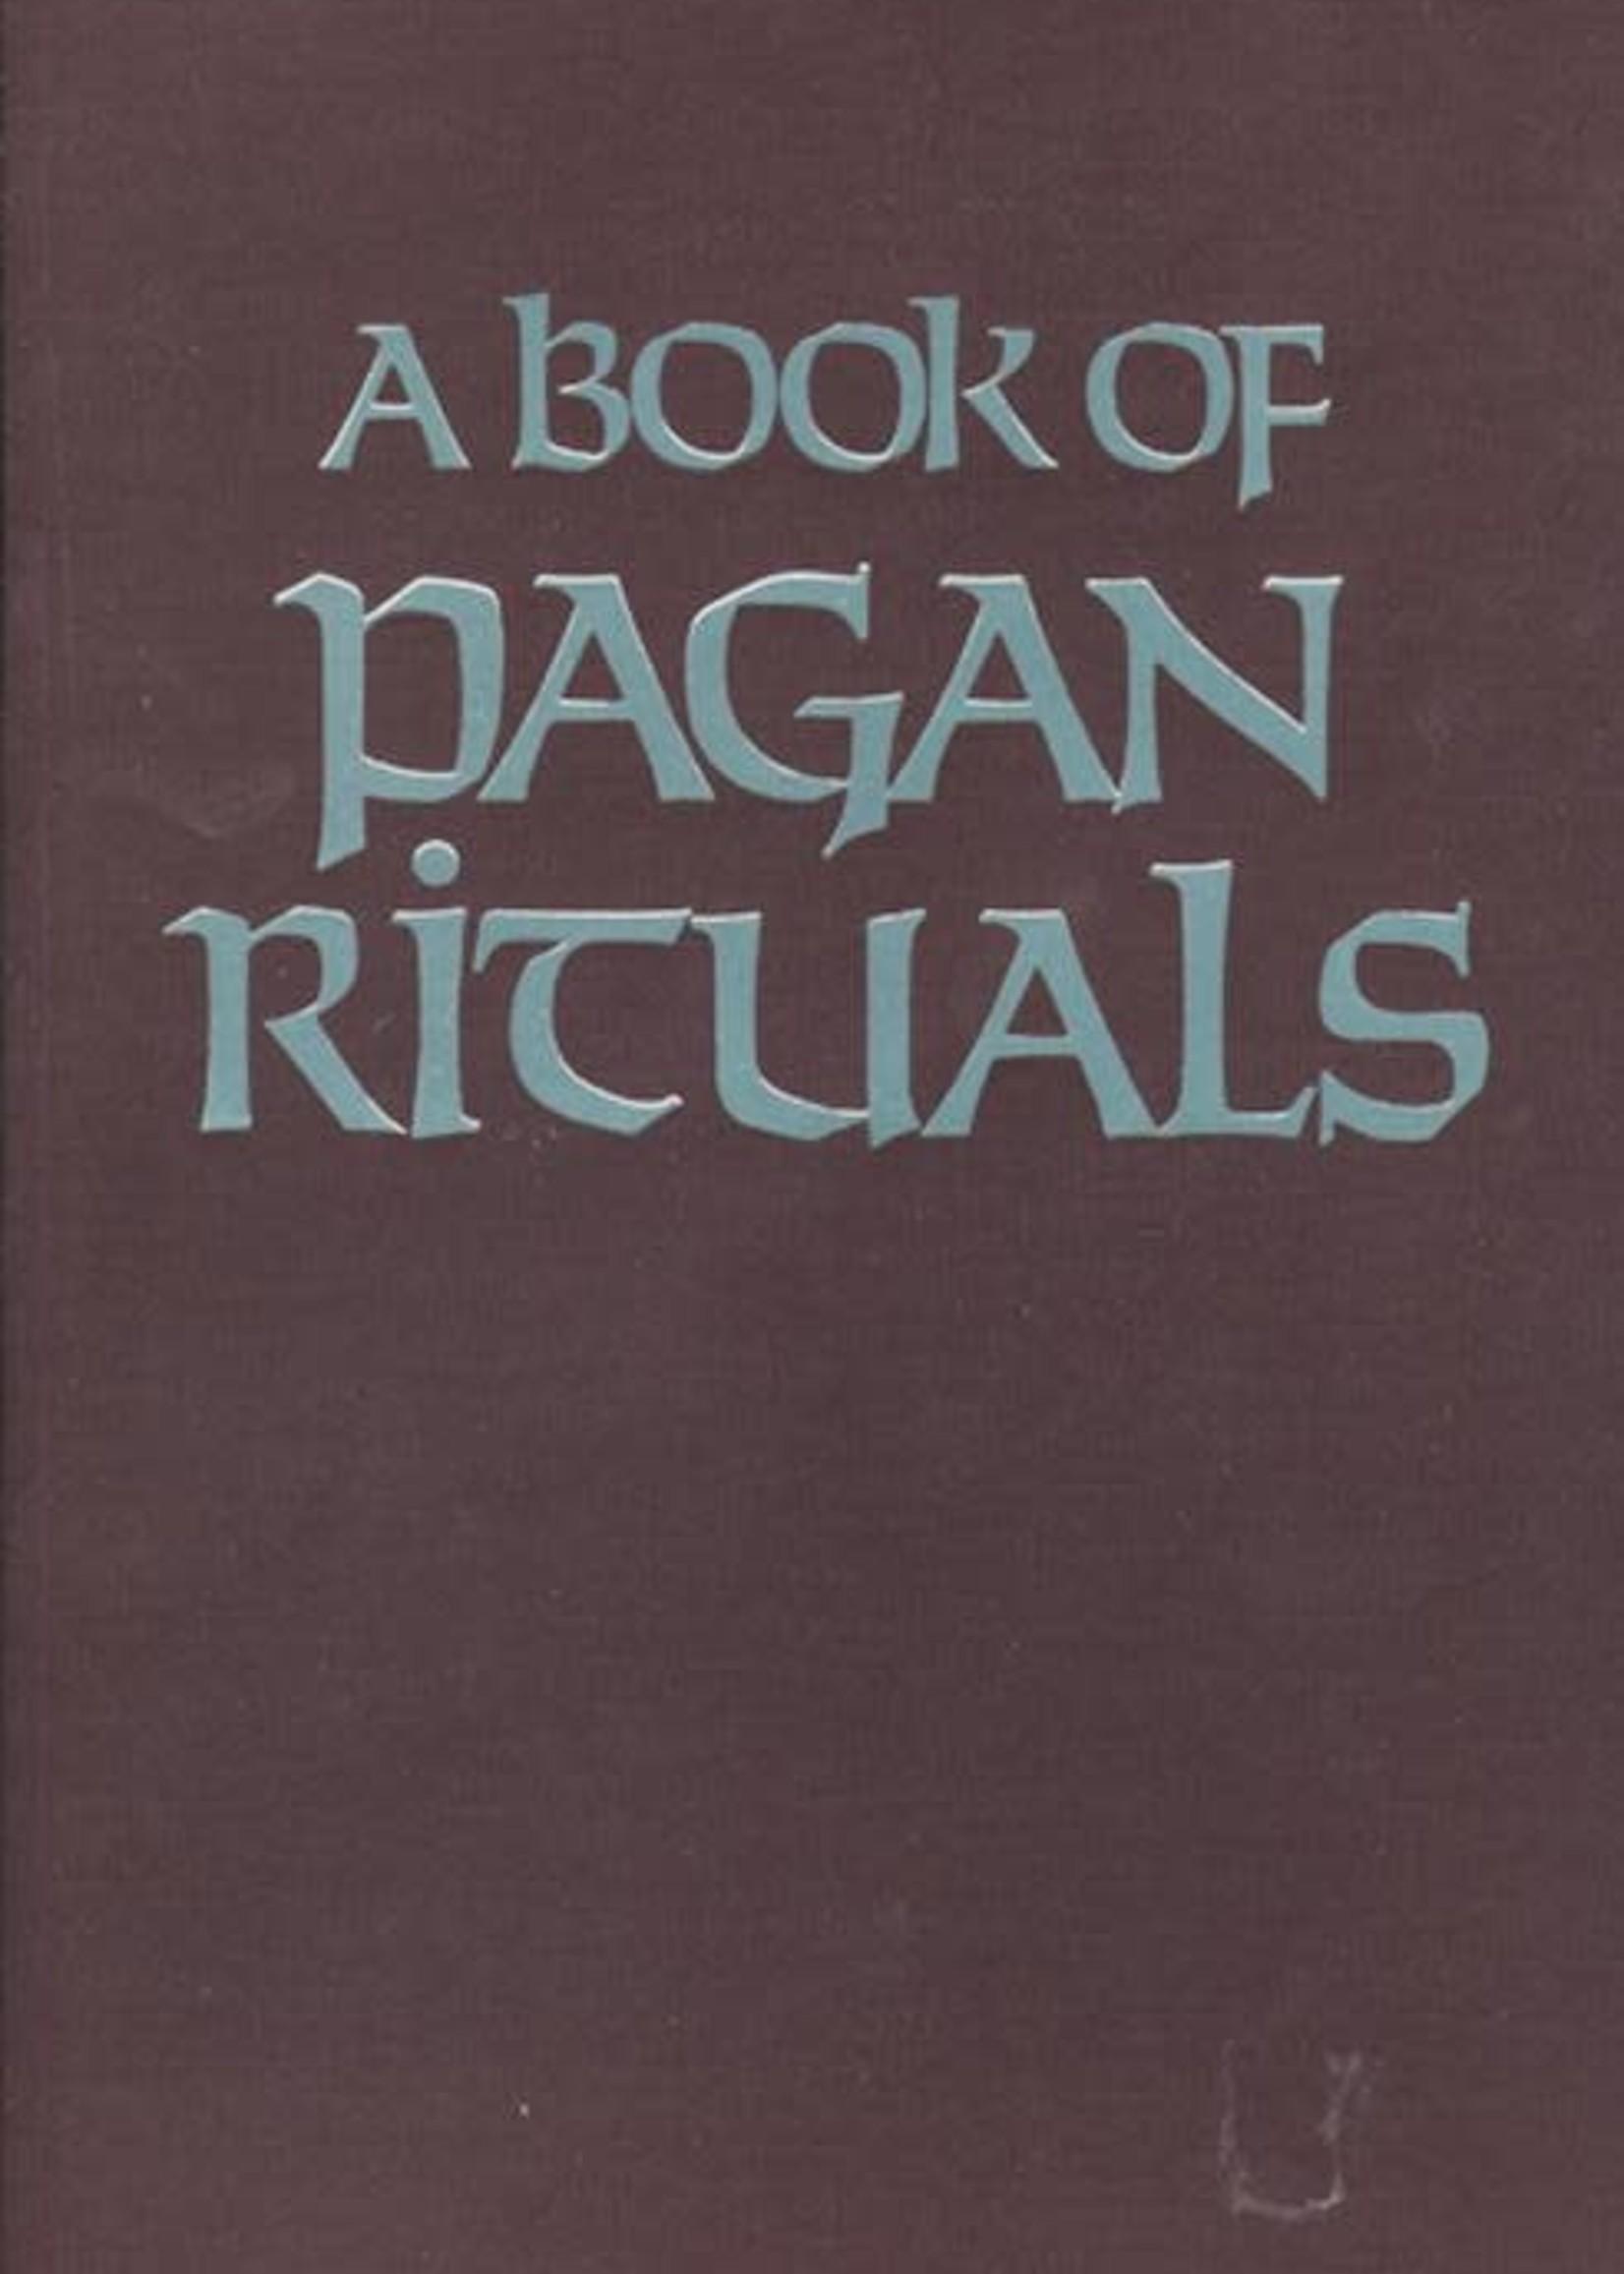 A Book of Pagan Rituals (Herman Slater)